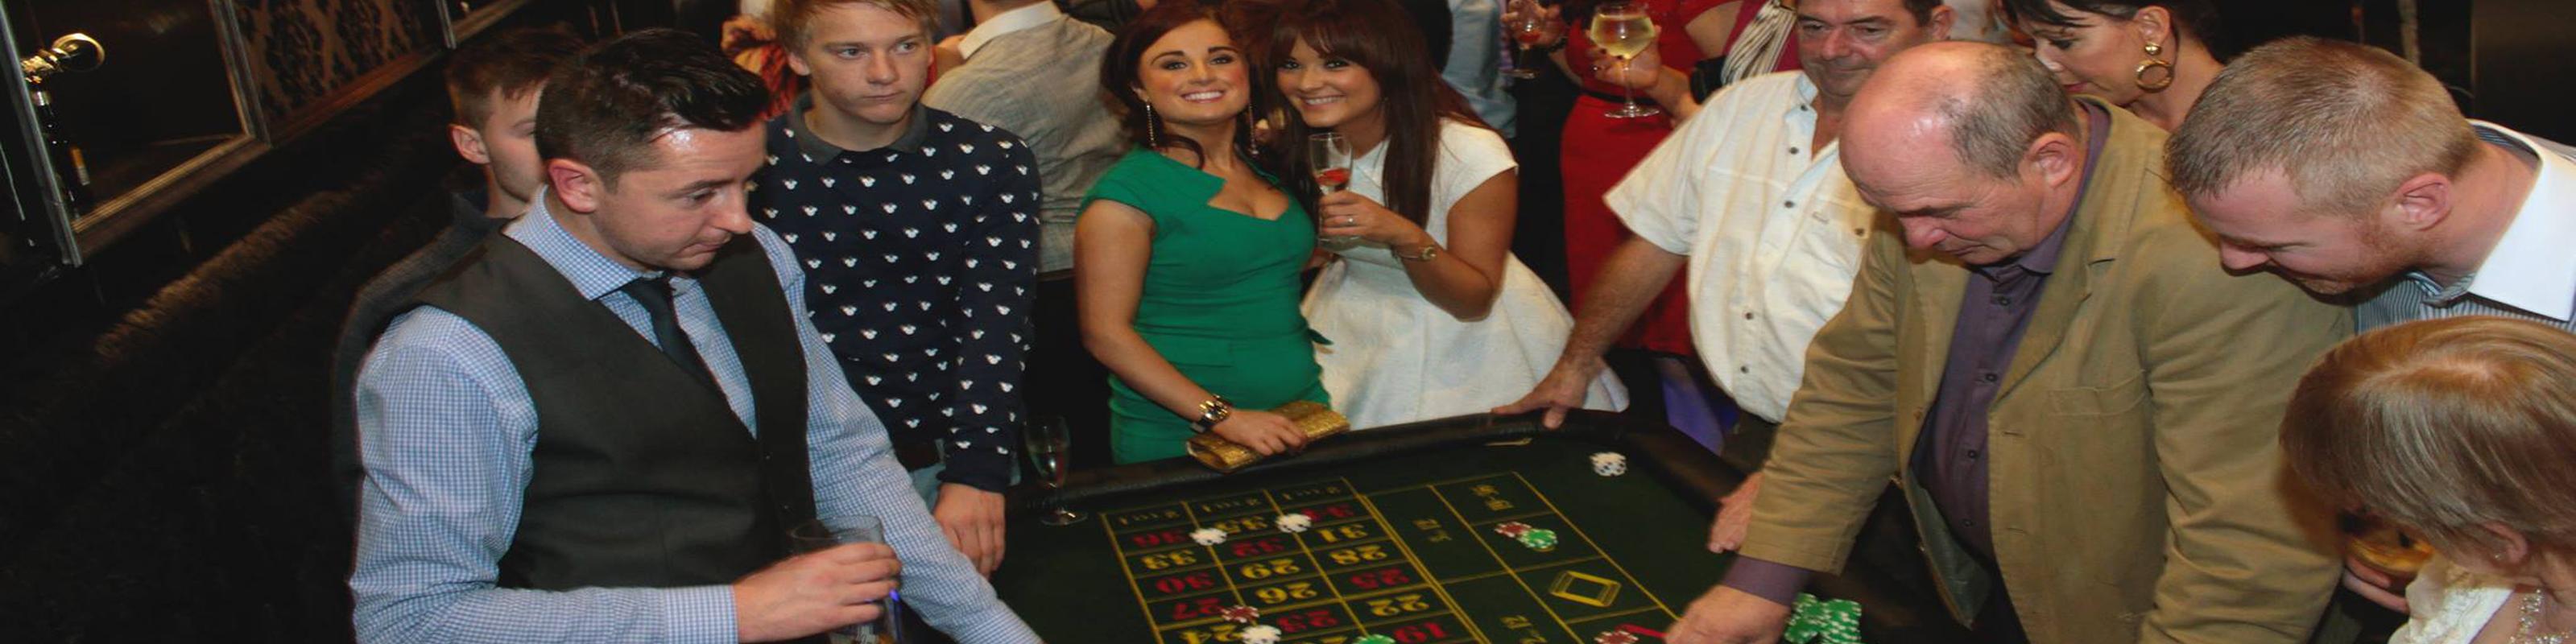 Fun Casino Hire Ireland Roulette Amp Blackjack Nightsfun